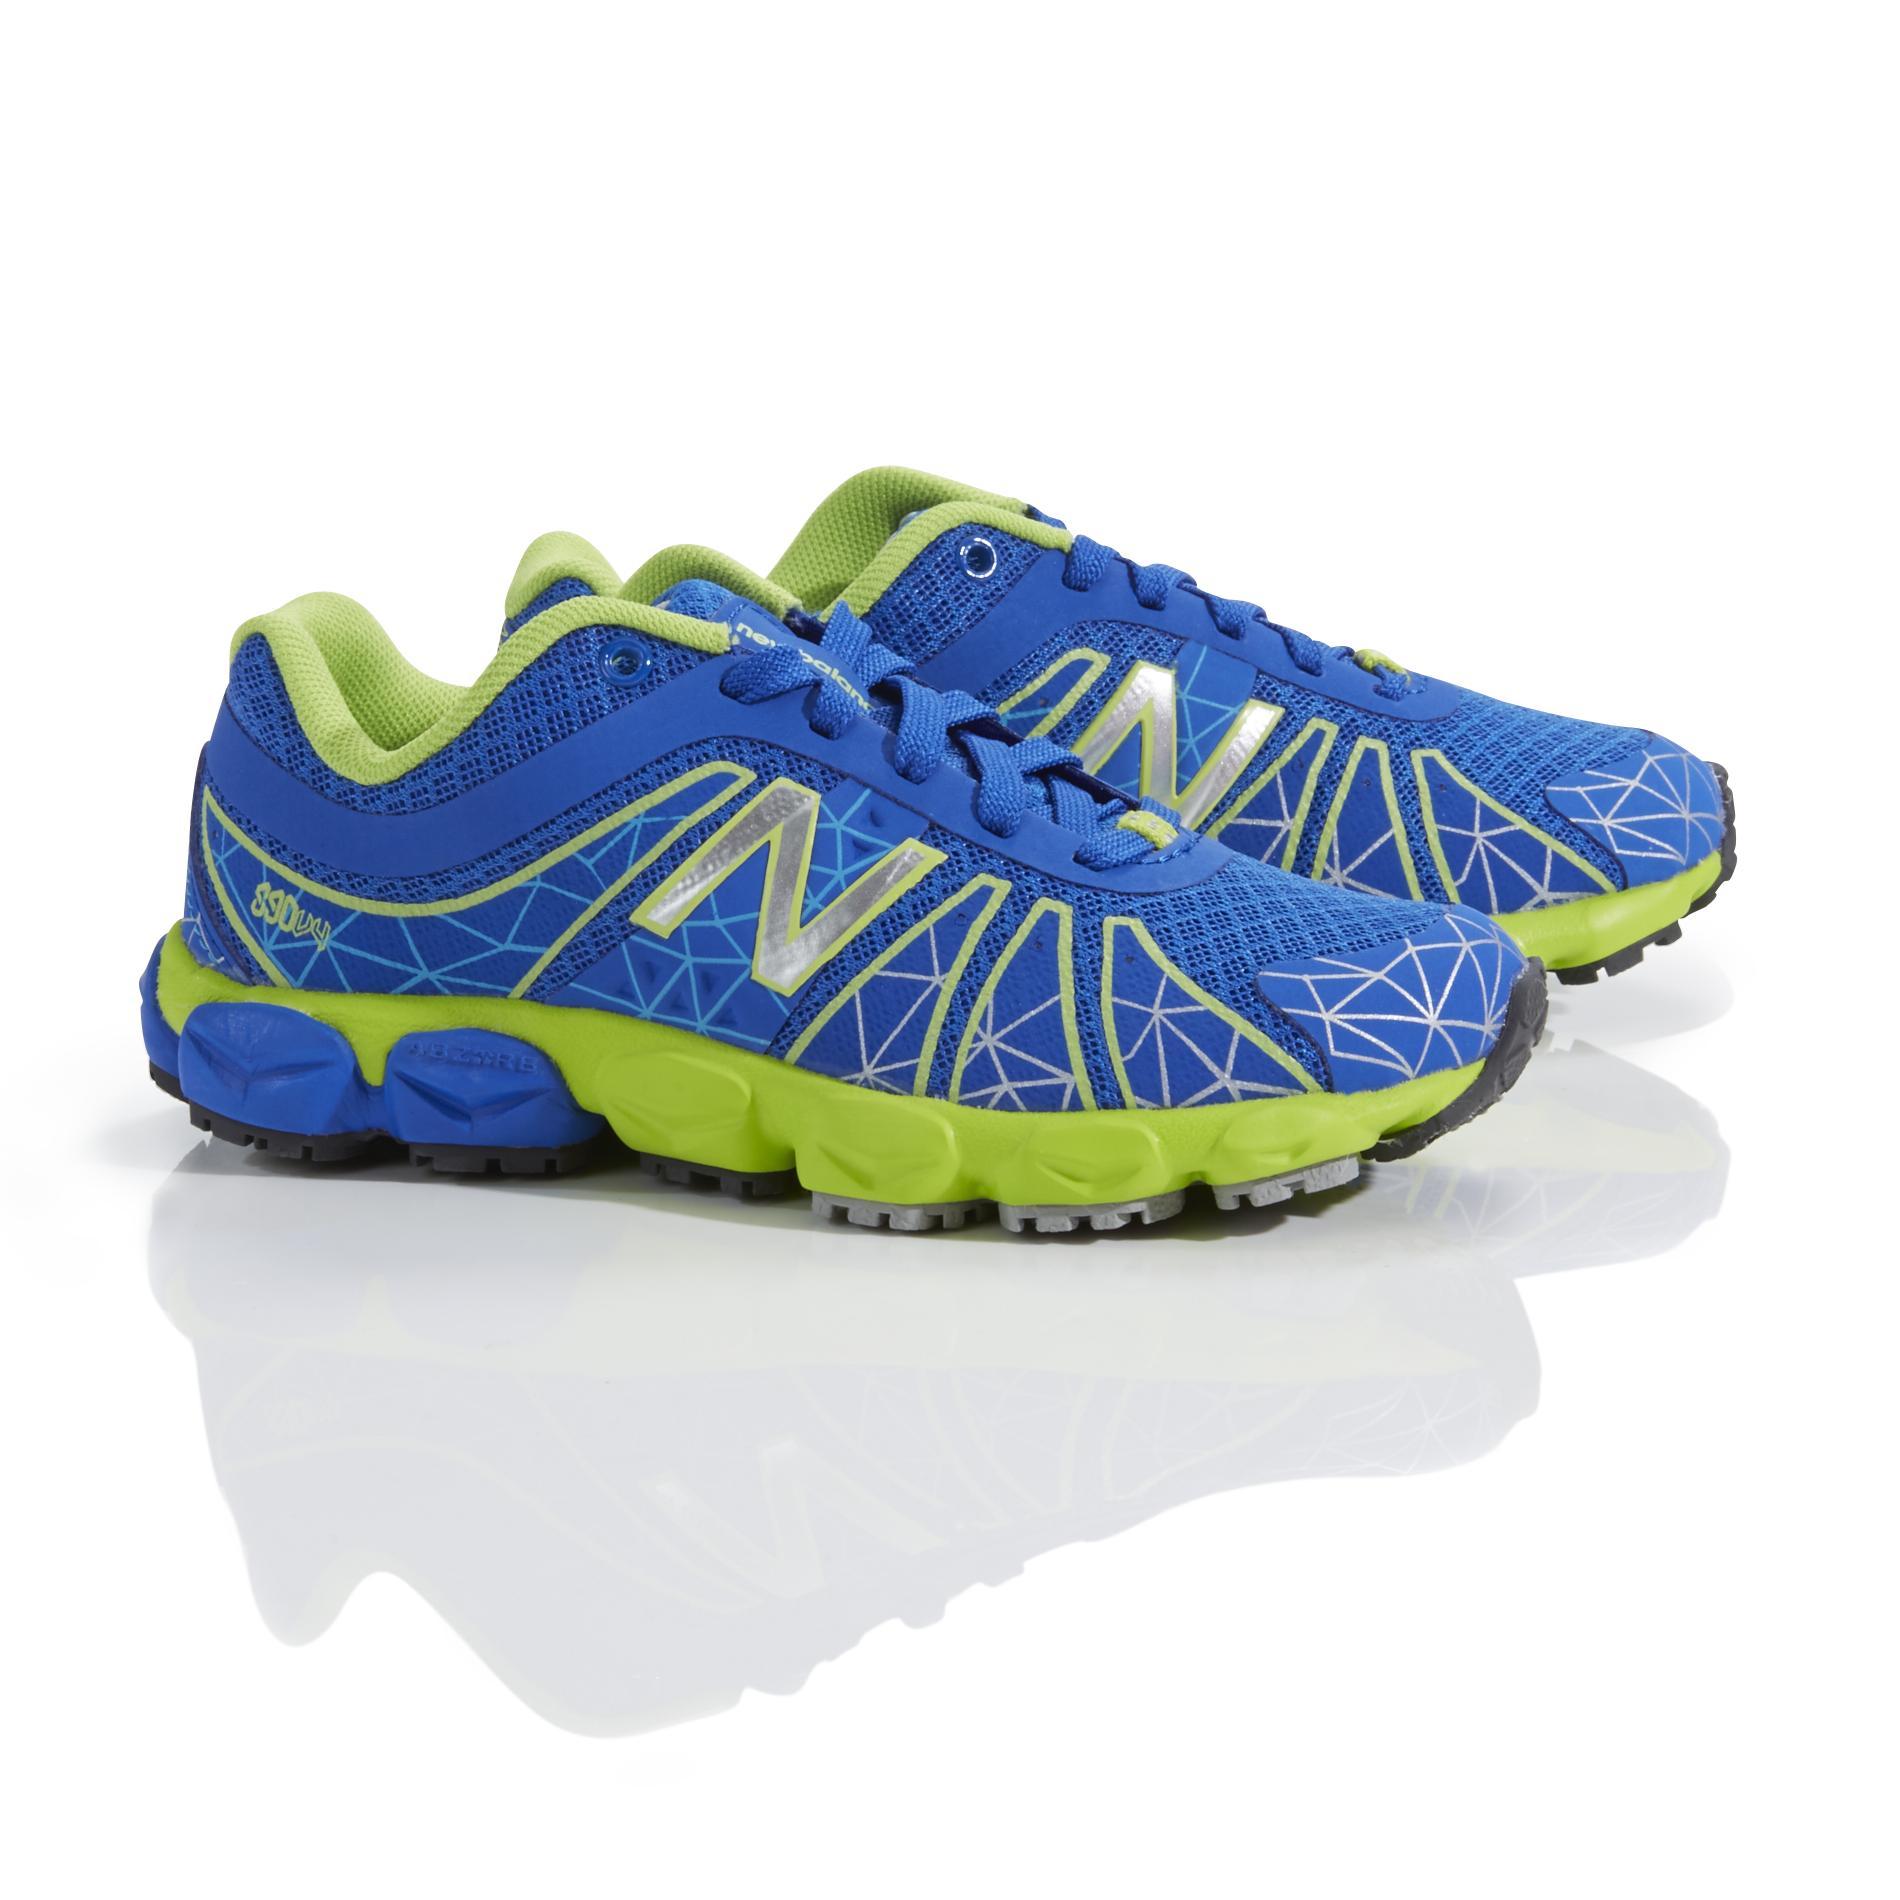 New Balance Boy's 890v4 Blue/Neon Green Running Shoe